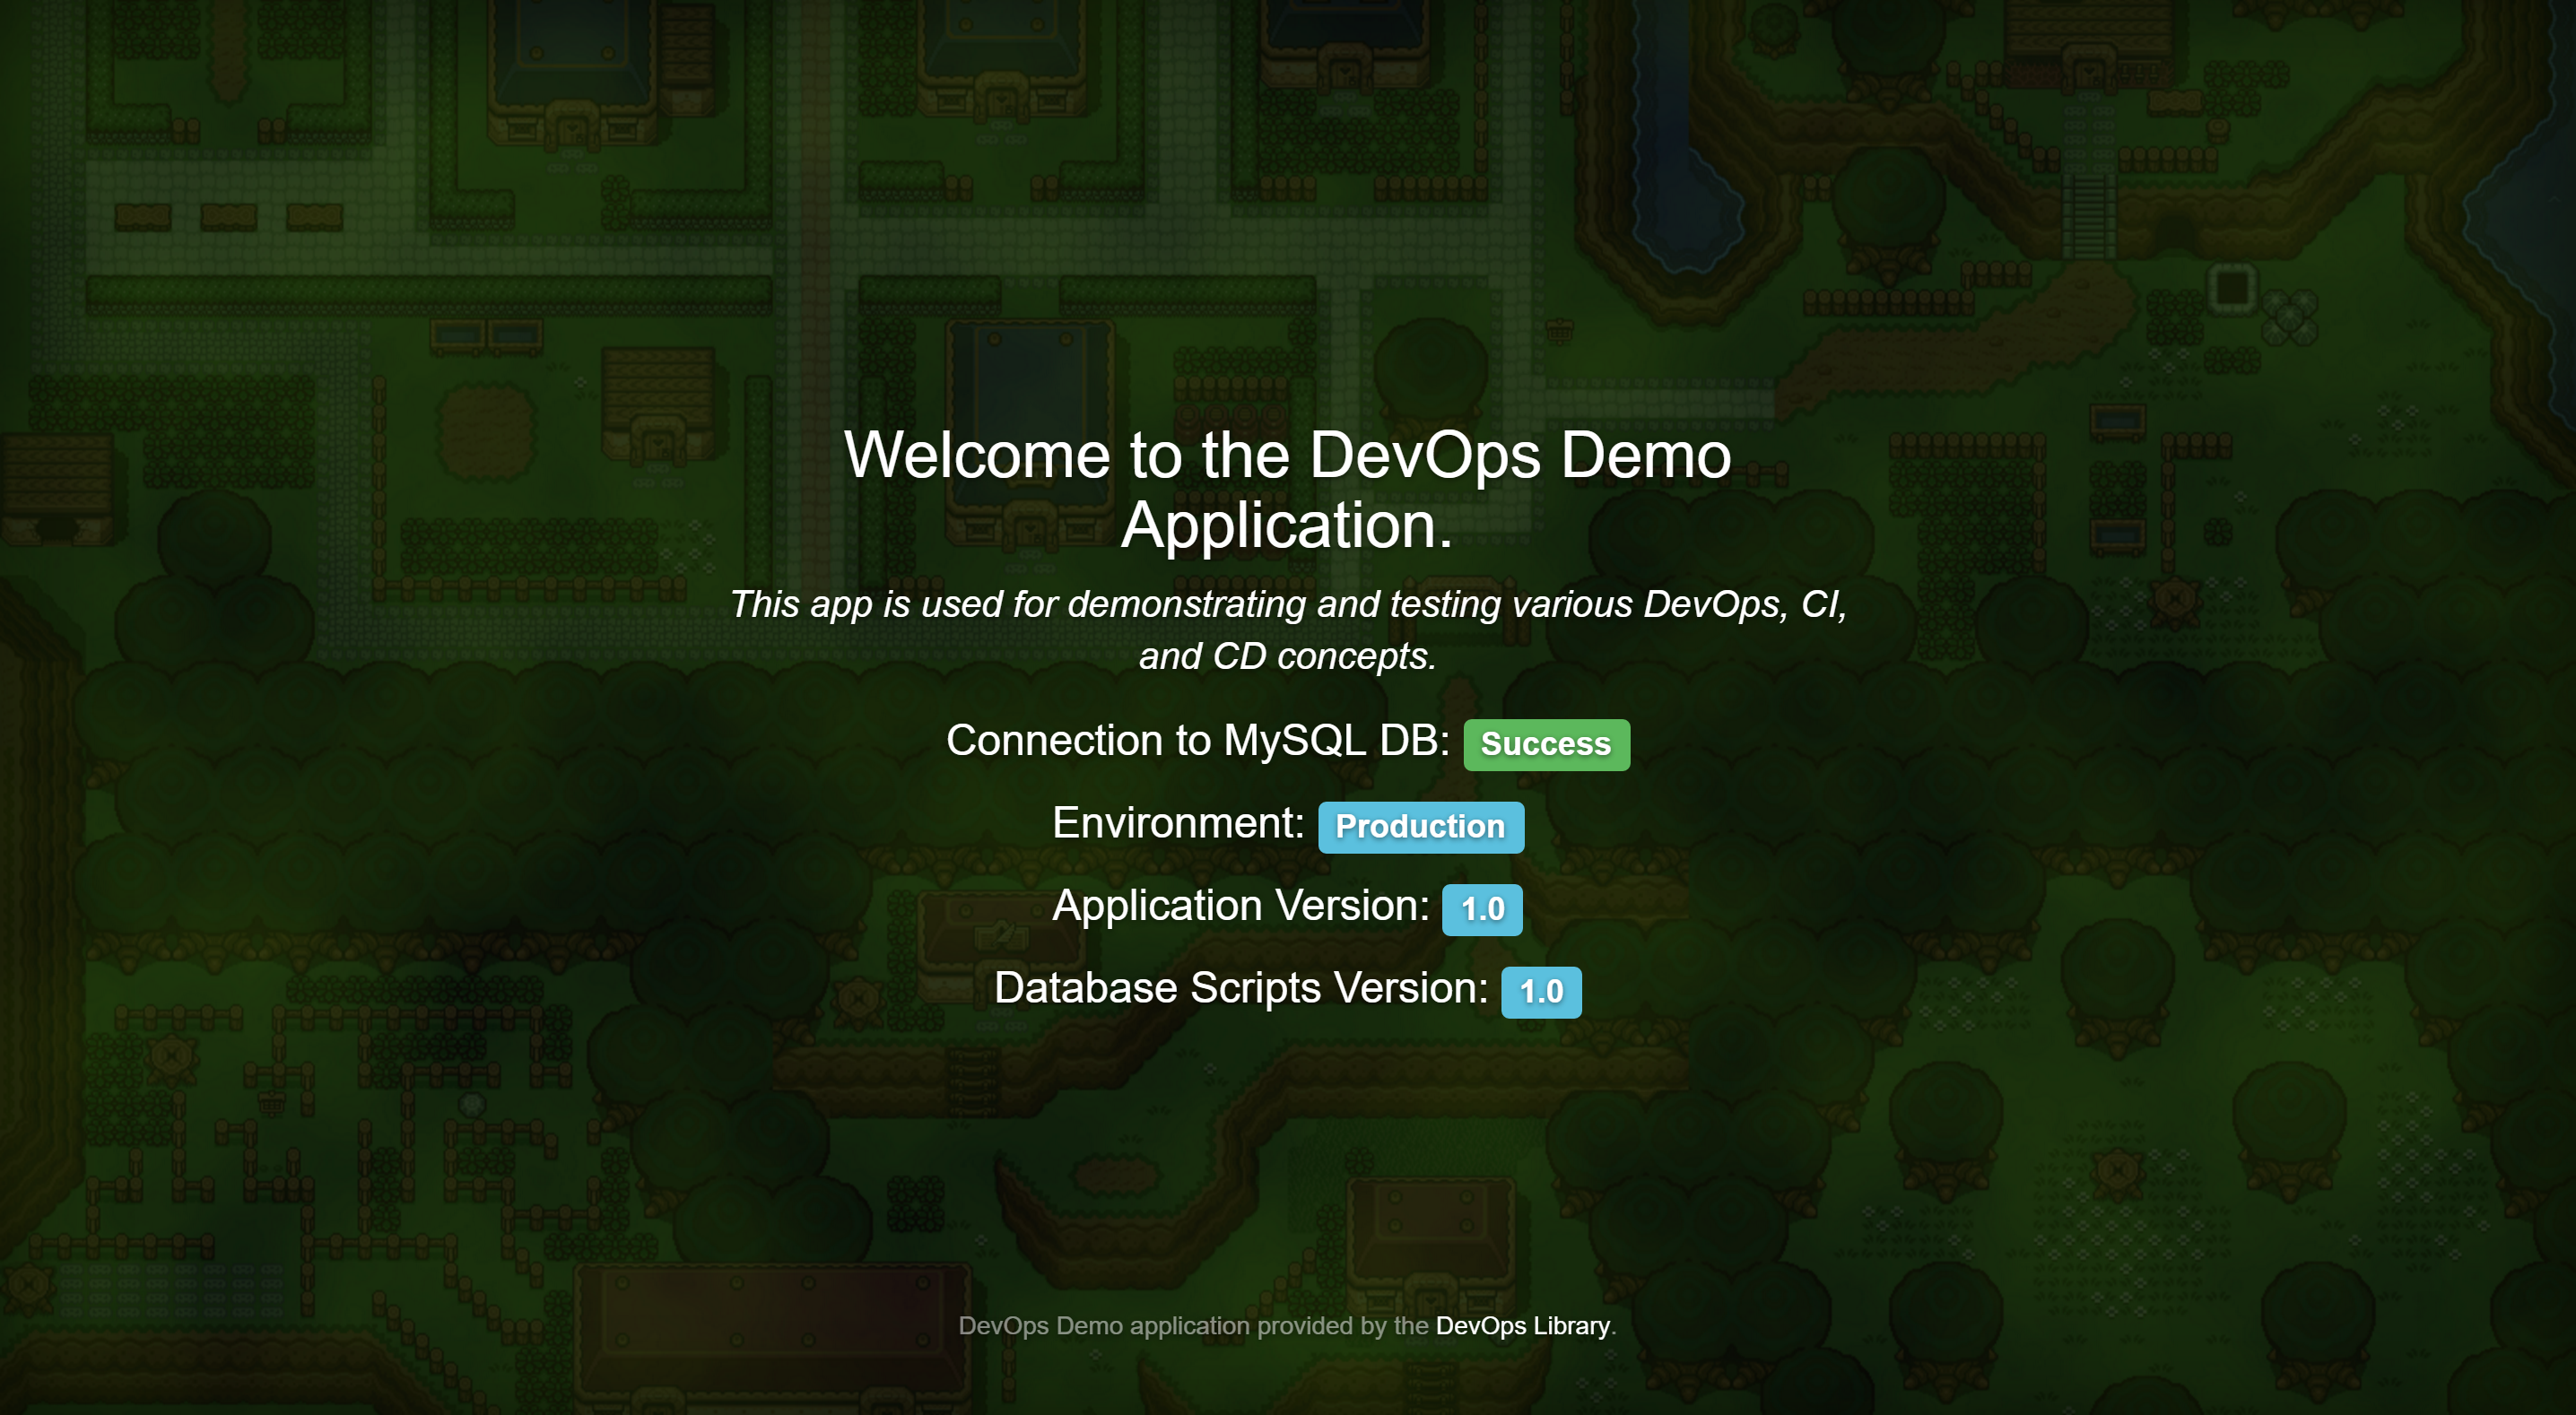 DevOps Demo Screenshot